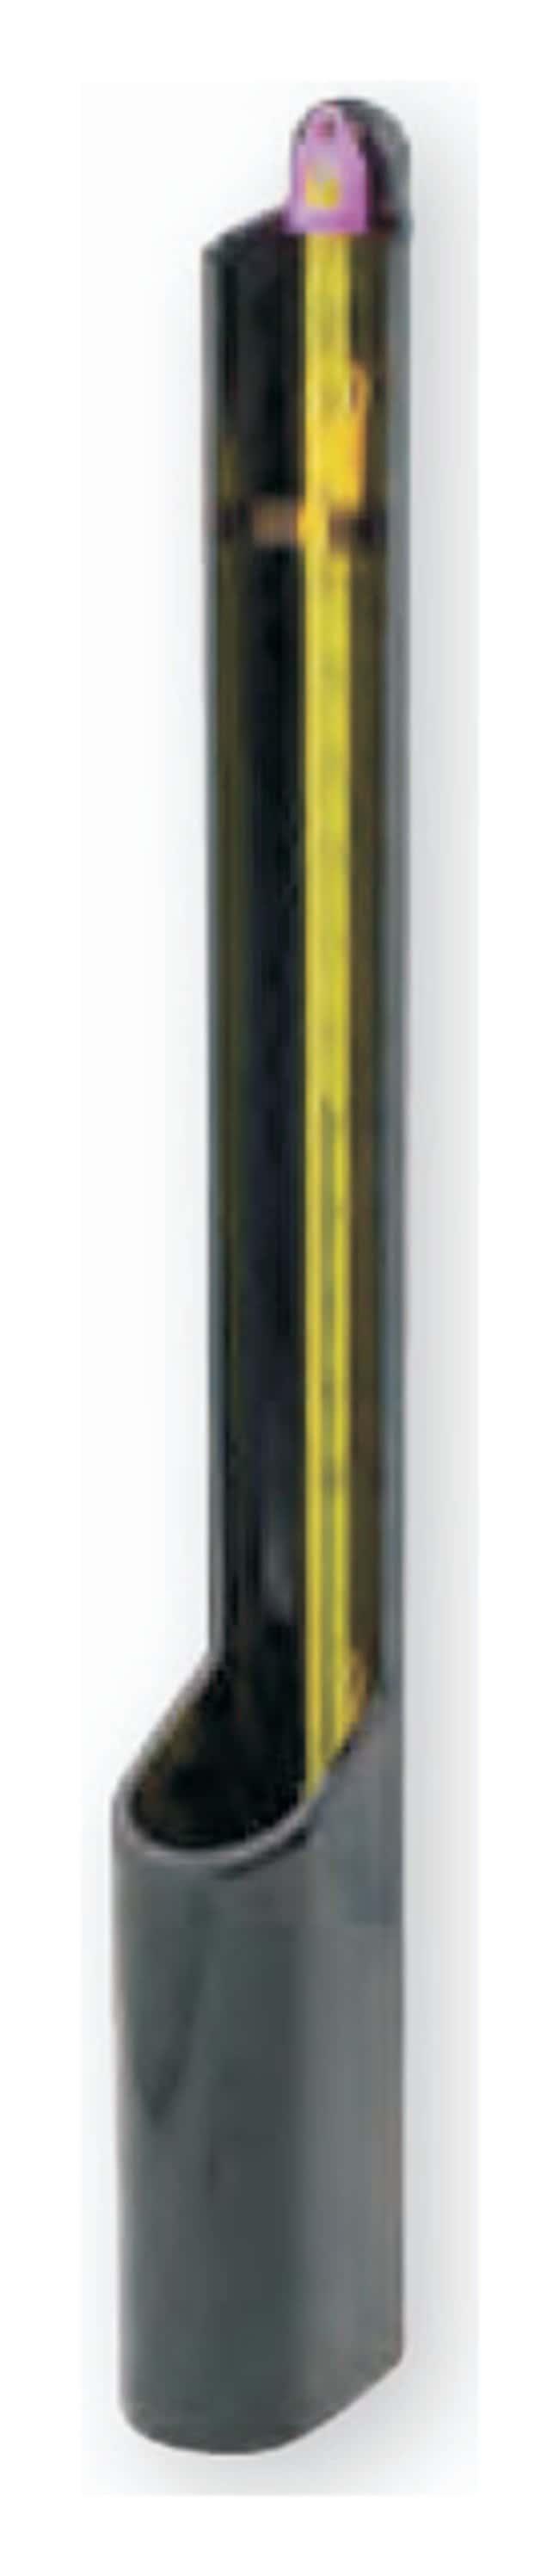 H-B Instrument Easy-Read Environmentally Friendly Liquid-In-Glass Tank